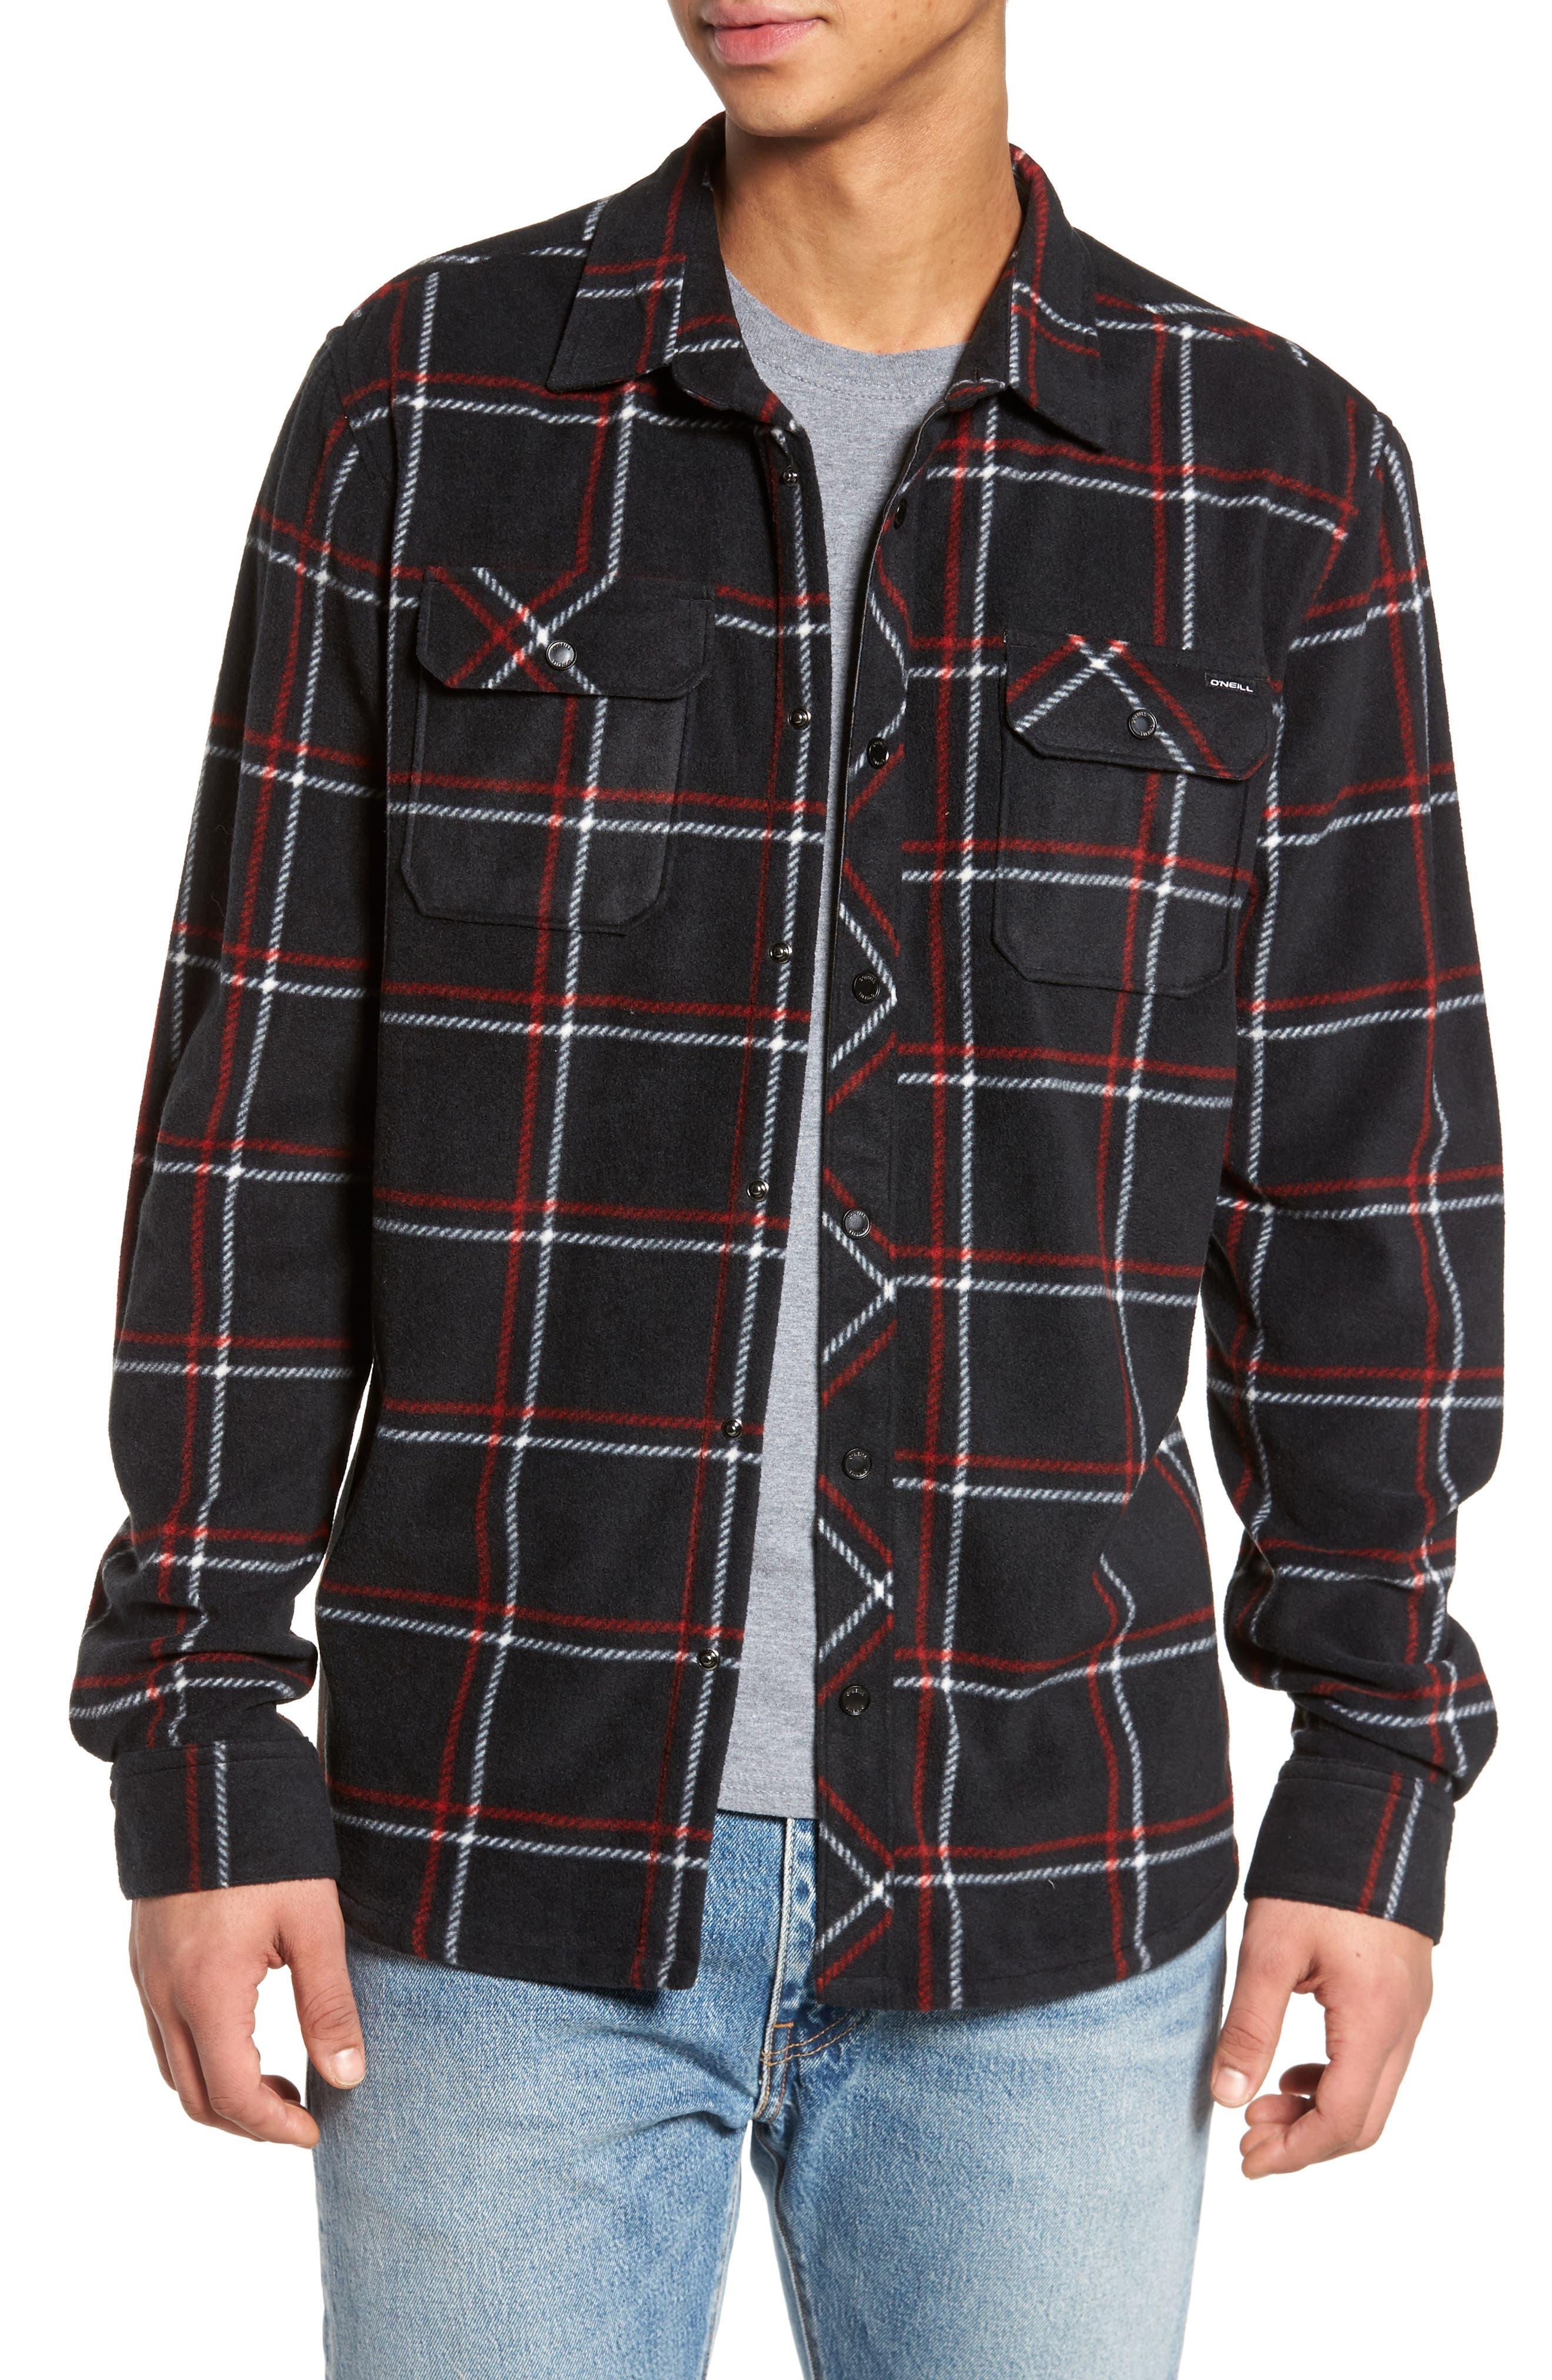 Glacier Series Fleece Shirt,                             Main thumbnail 1, color,                             001